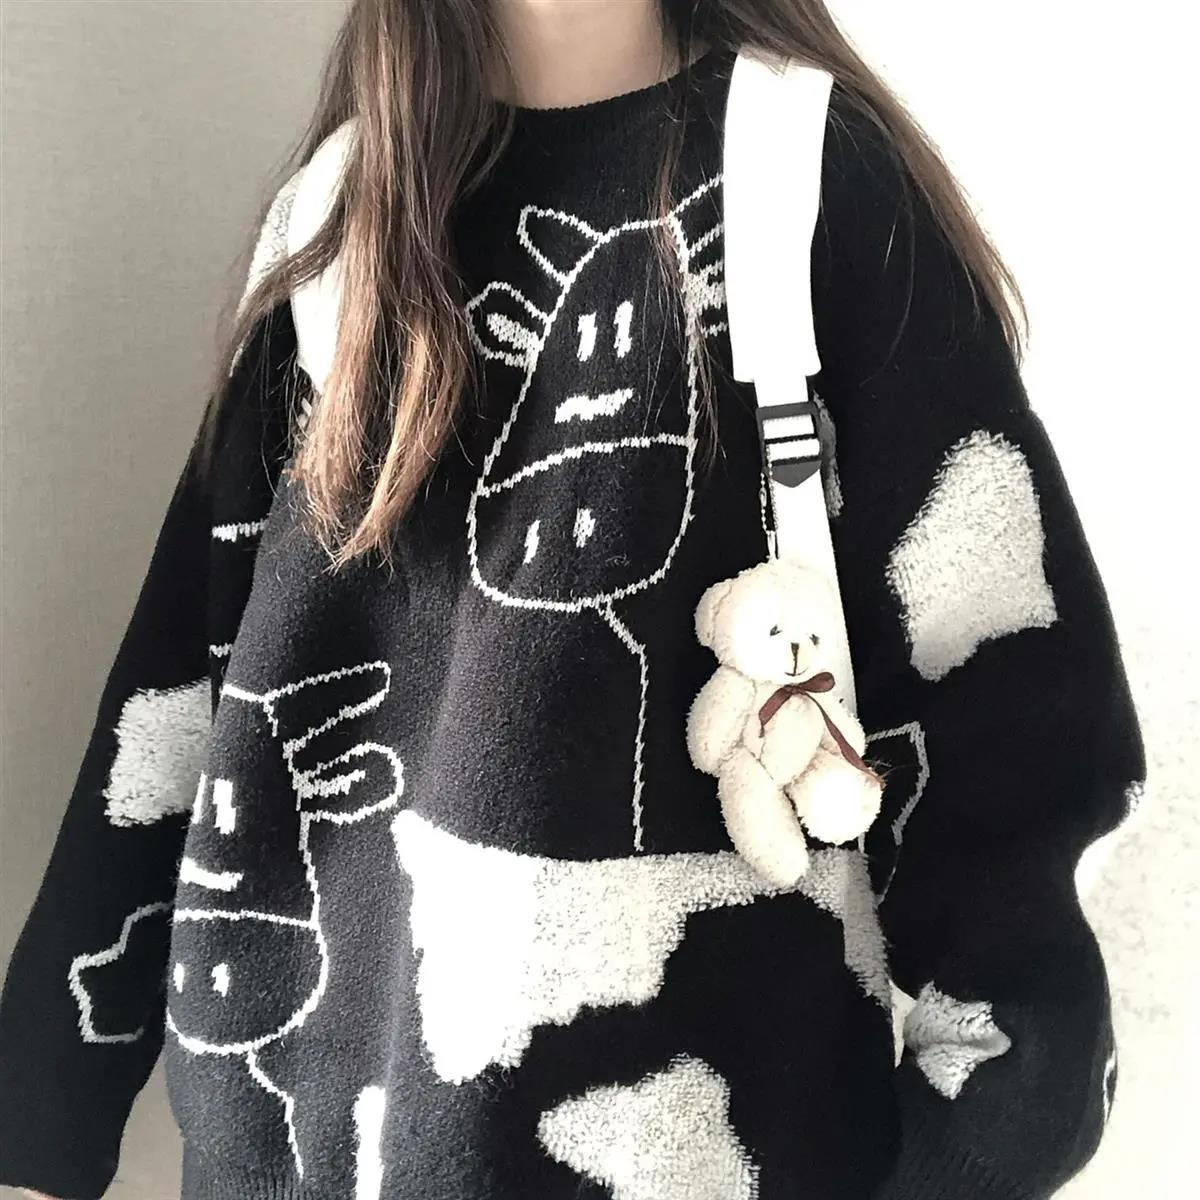 Egirl Harajuku pullover with a cow print 49